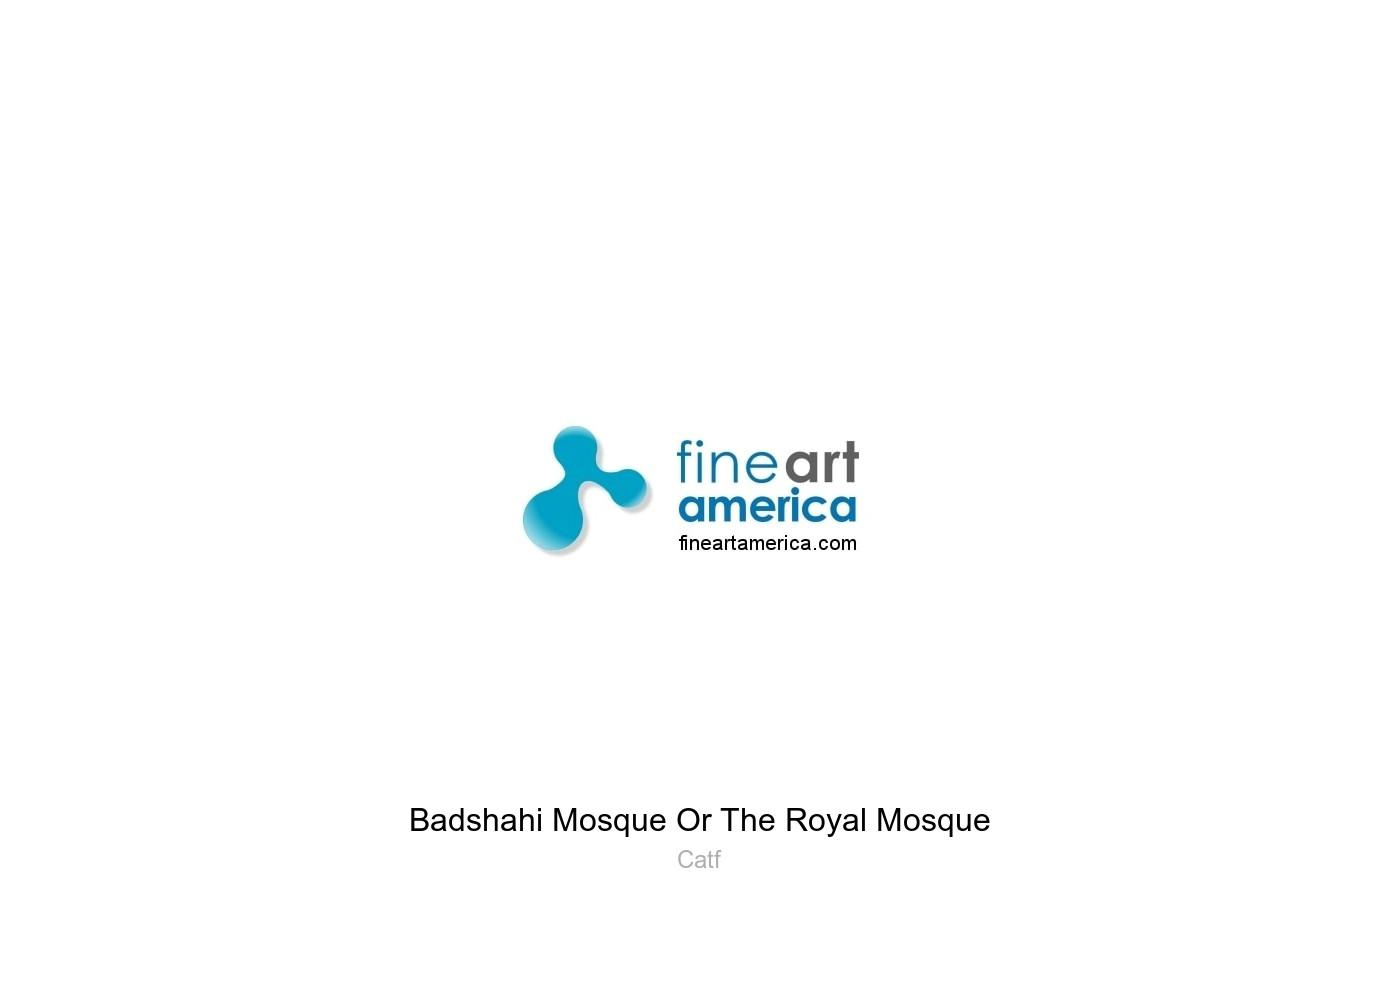 Badshahi Mosque Or The Royal Mosque Greeting Card